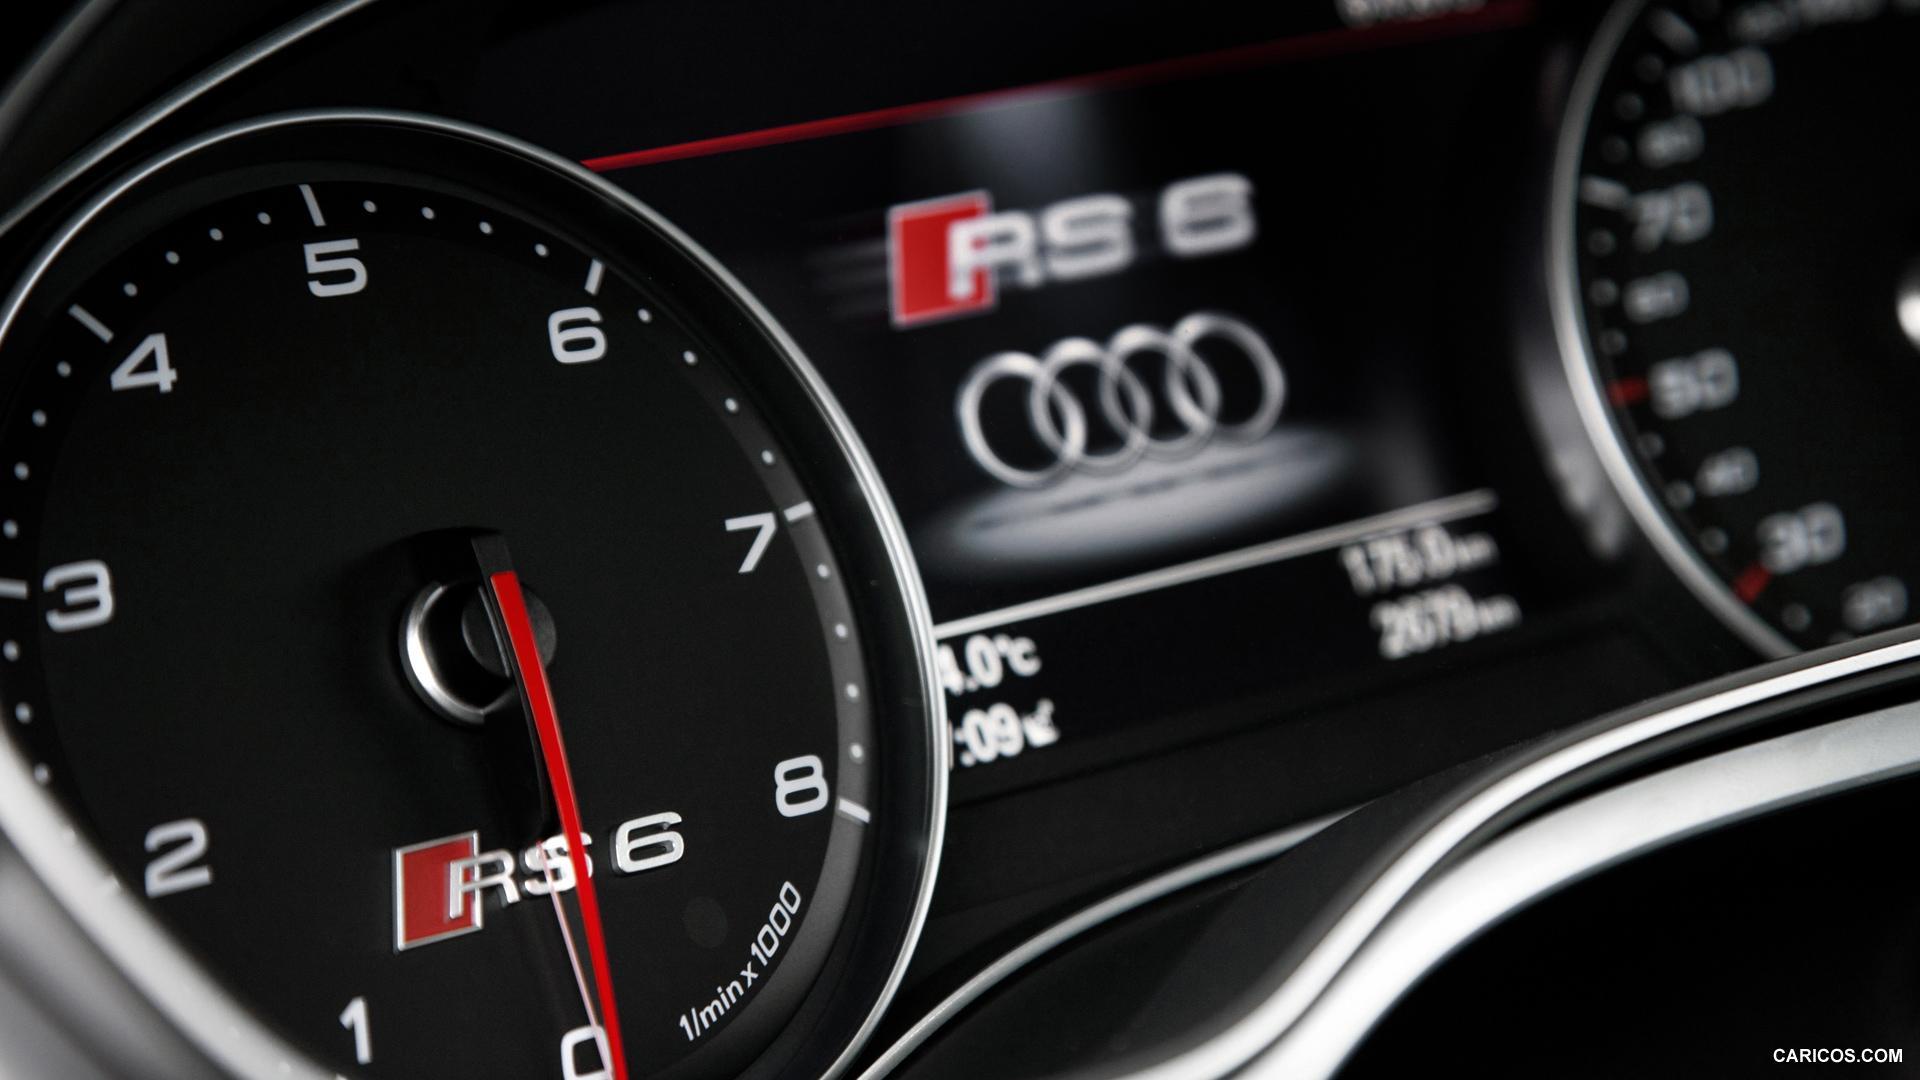 Audi Rs 6 Wallpapers Wallpaper Cave